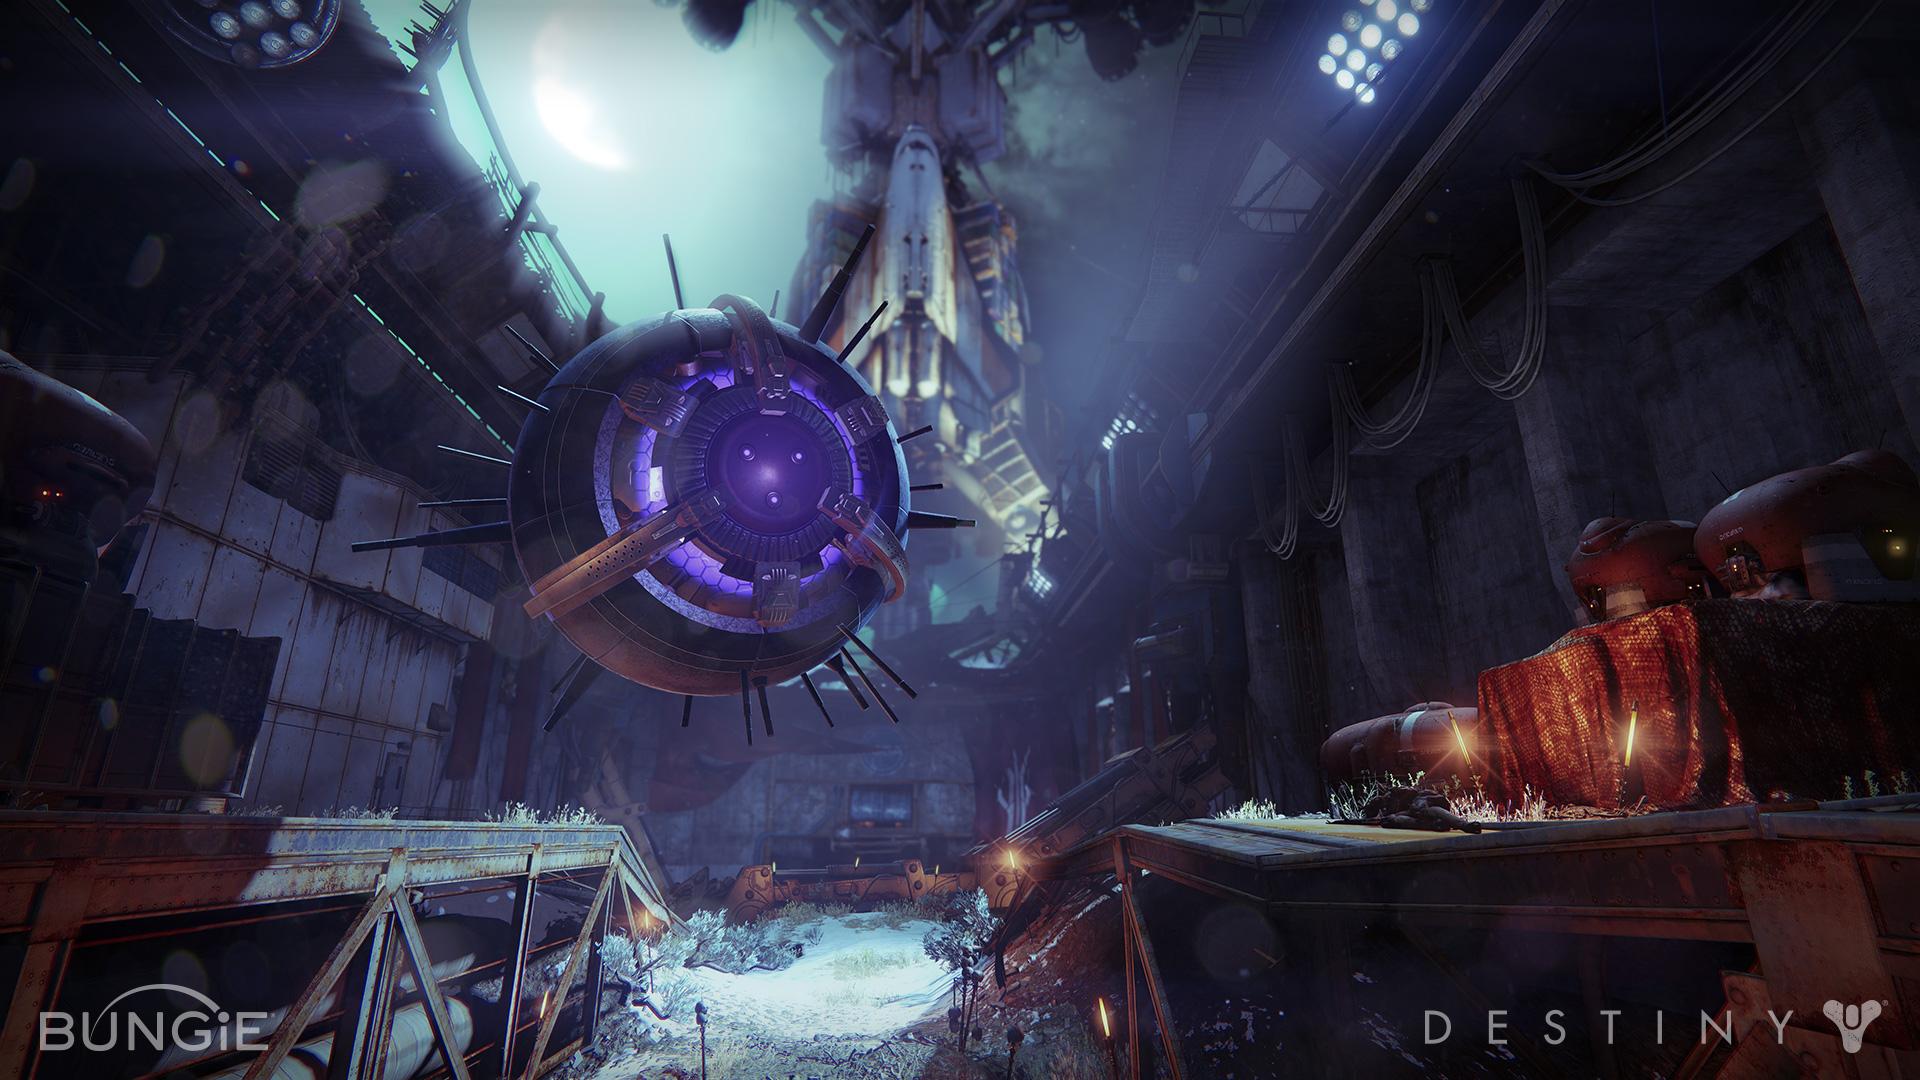 destiny video games wallpaper - photo #17